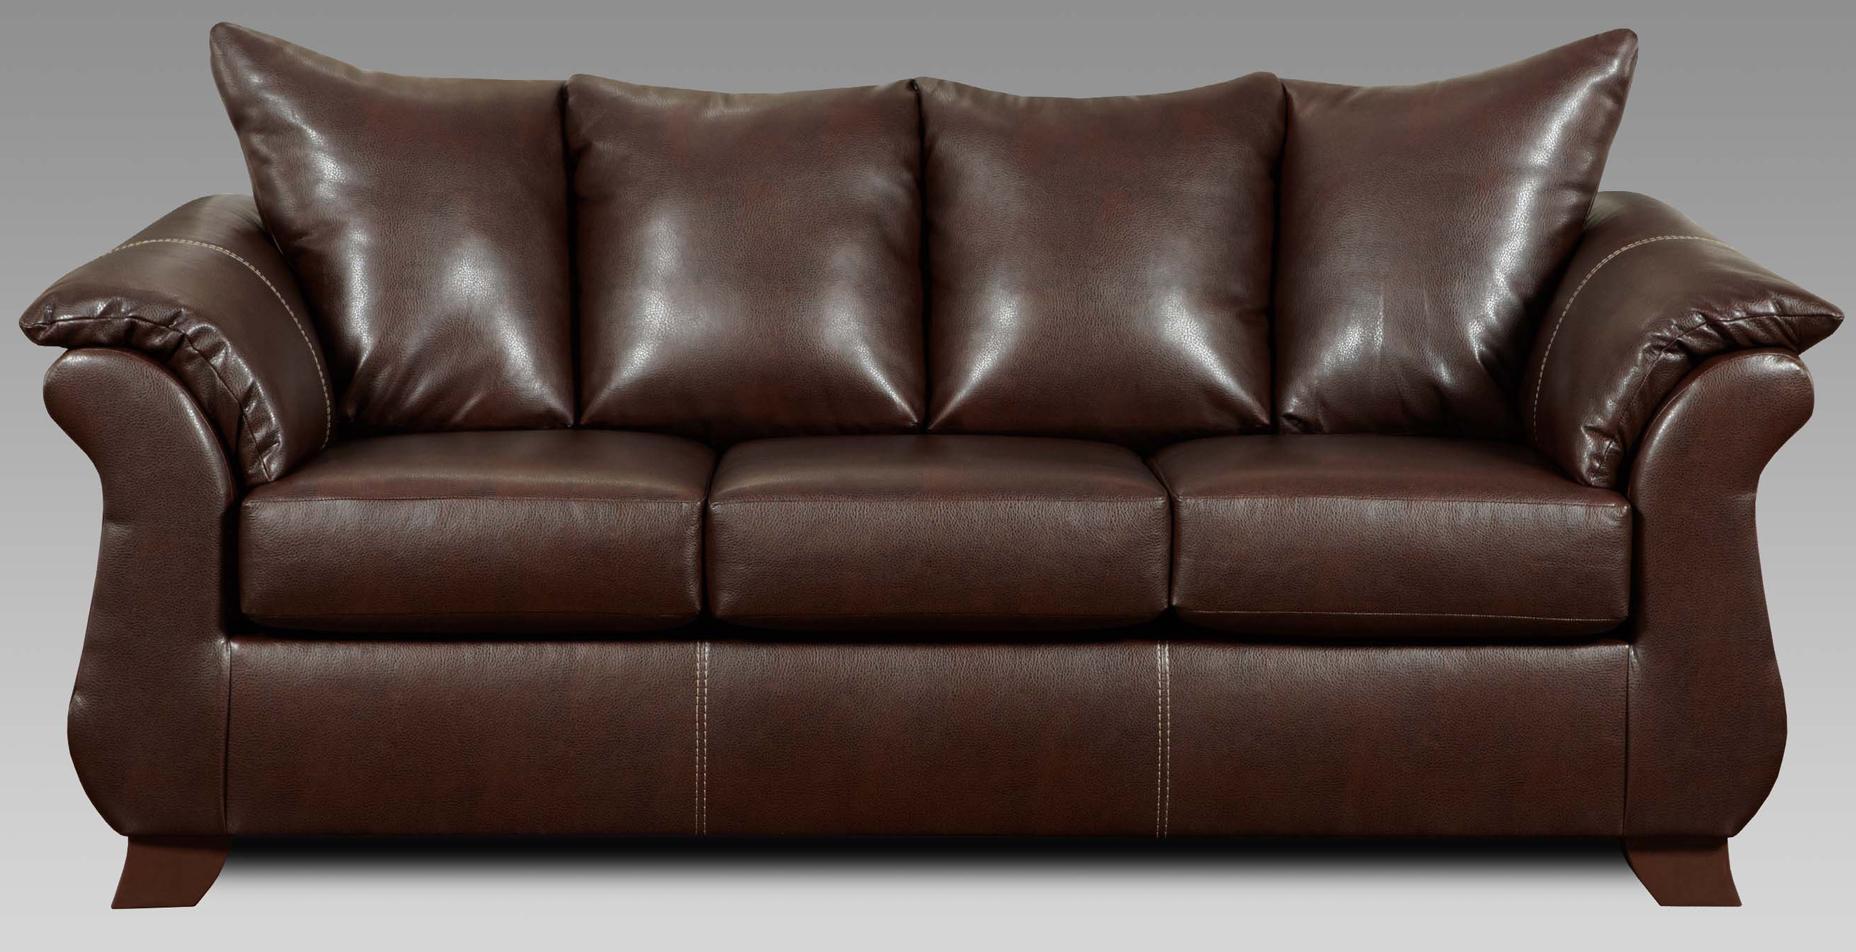 Affordable Furniture 6700 Queen Sleeper - Item Number: 6704